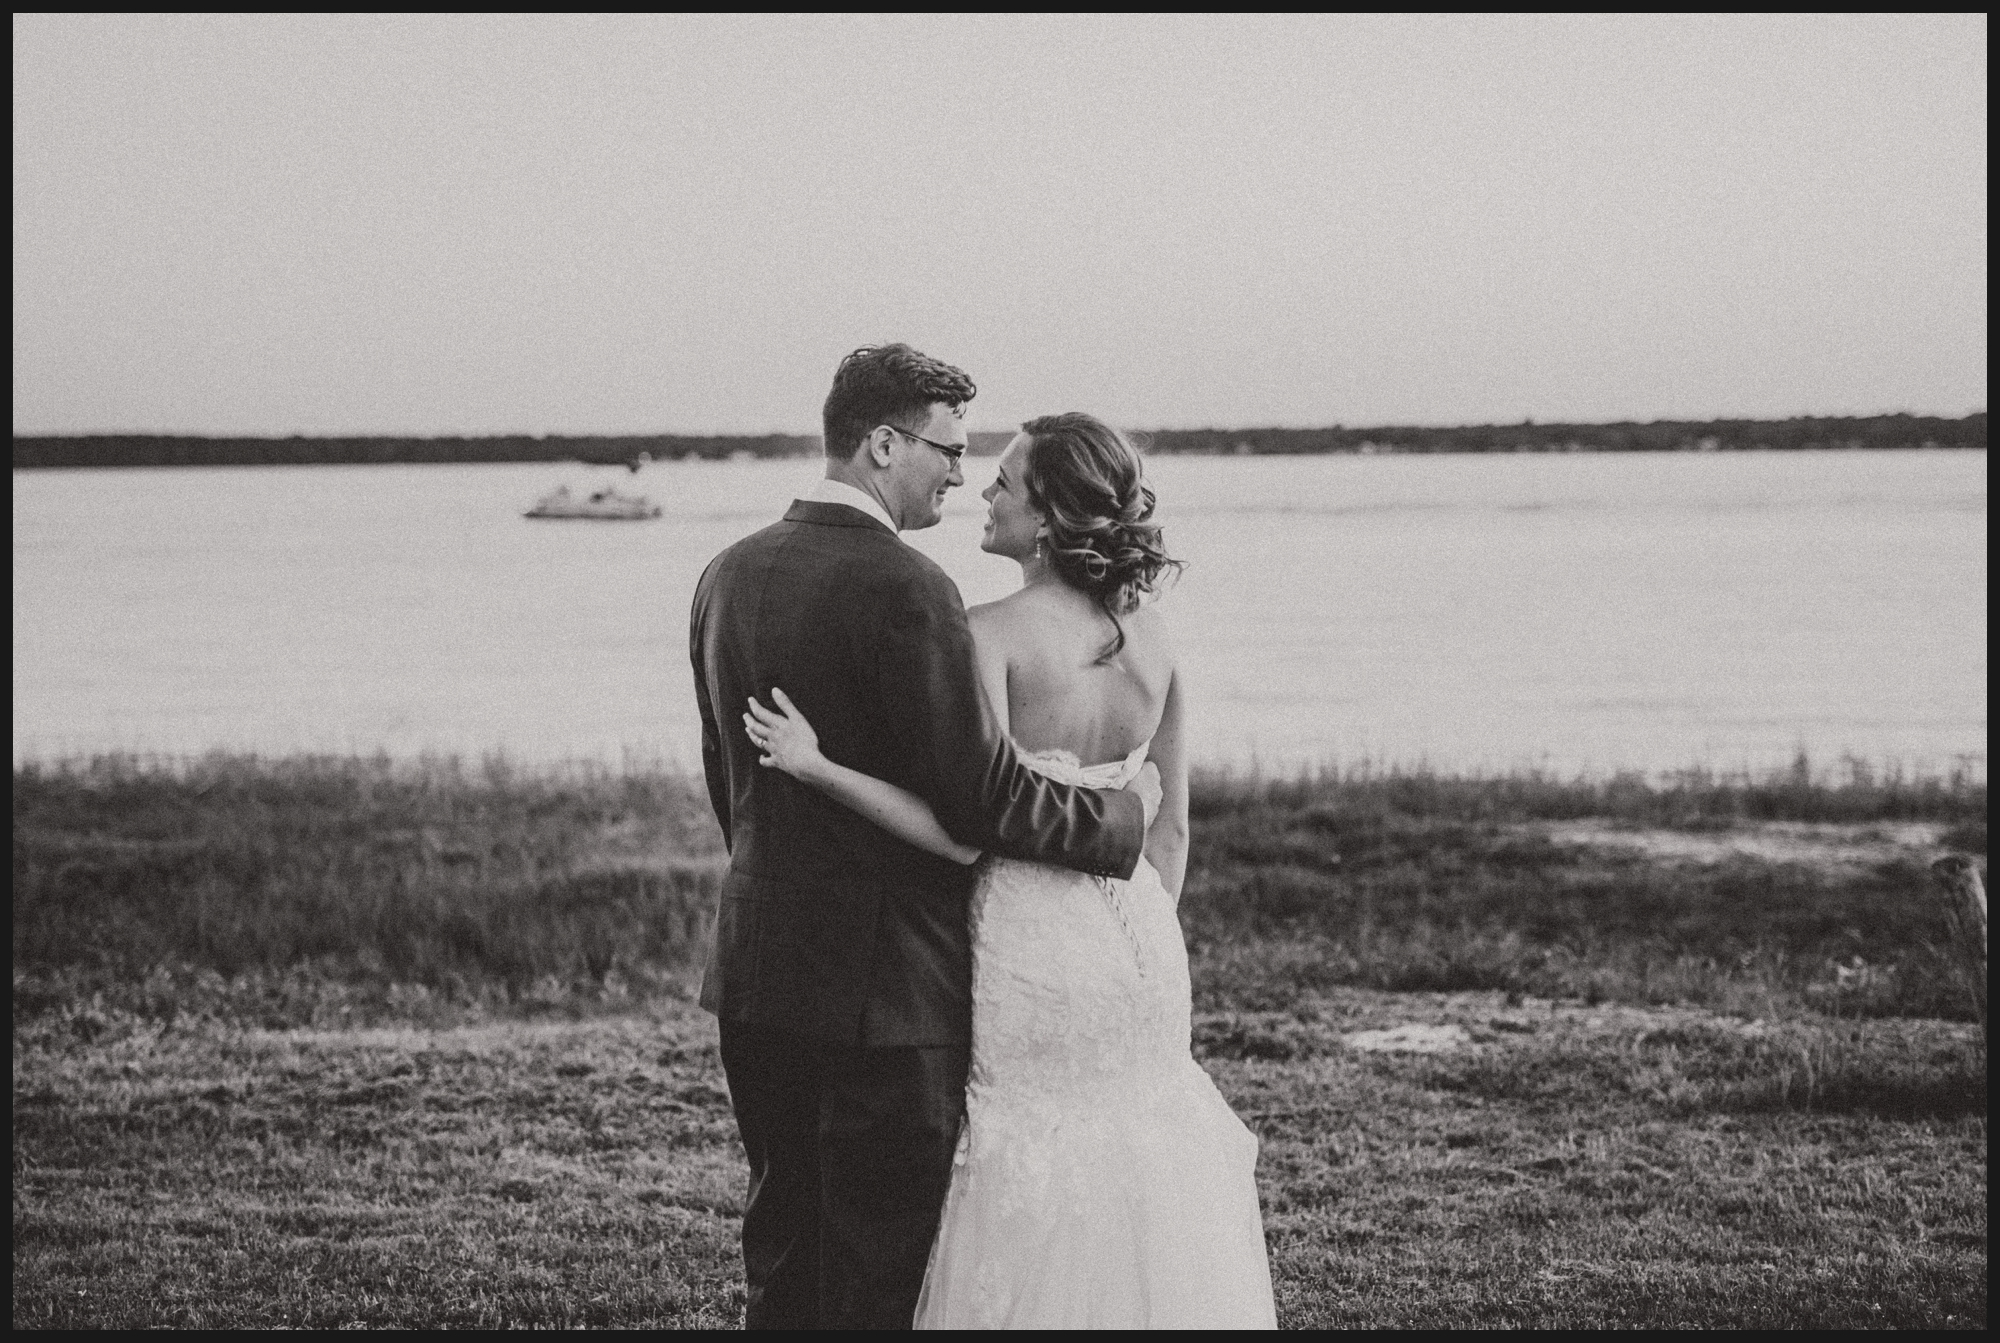 Orlando-Wedding-Photographer-destination-wedding-photographer-florida-wedding-photographer-bohemian-wedding-photographer_0121.jpg